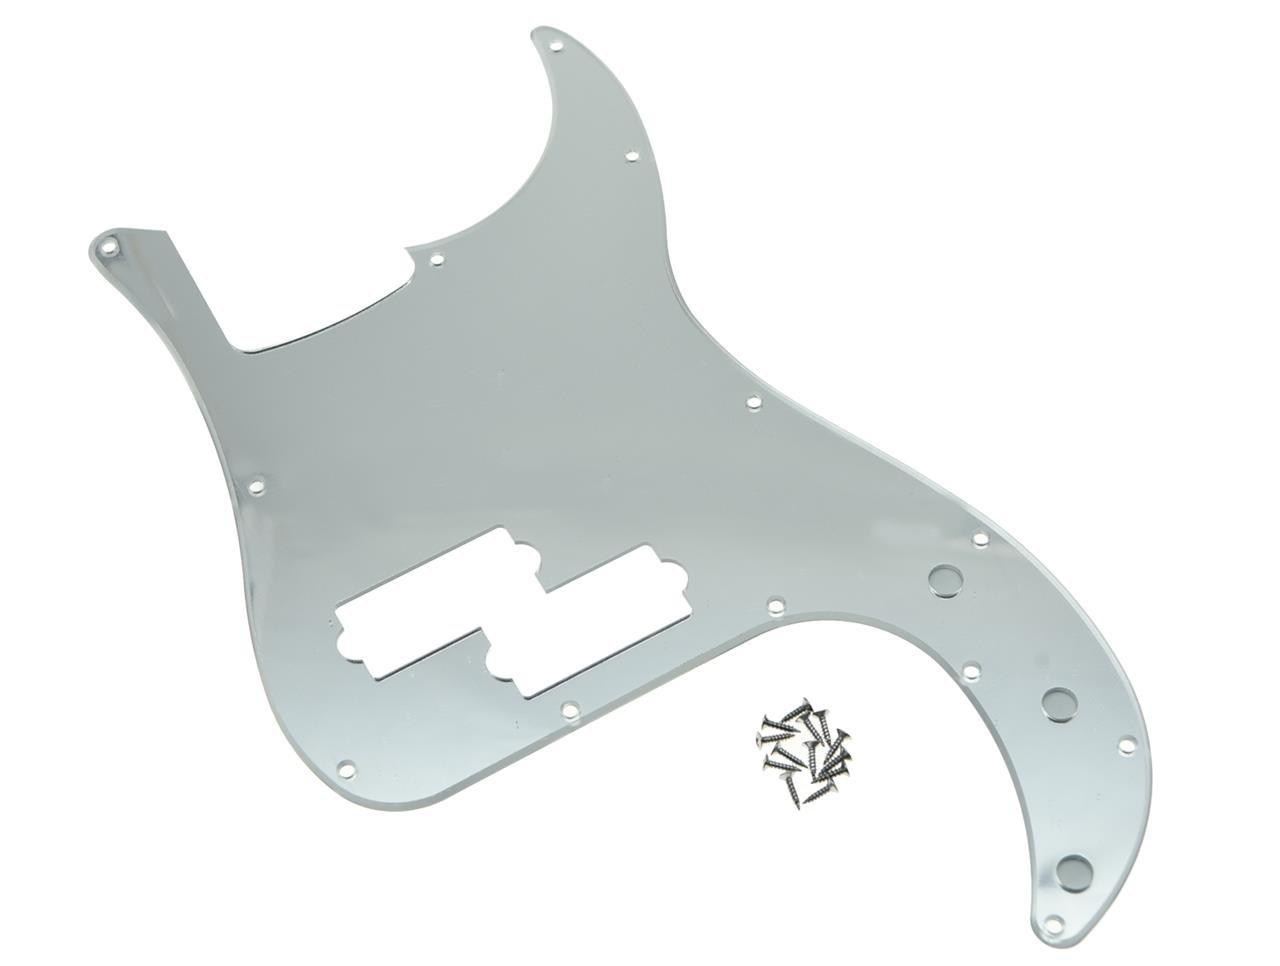 KAISH 13 Hole Precision Bass Pickguard PB P Bass Scratch Plate Fits USA/Mexican Fender Precision Bass Silver Mirror